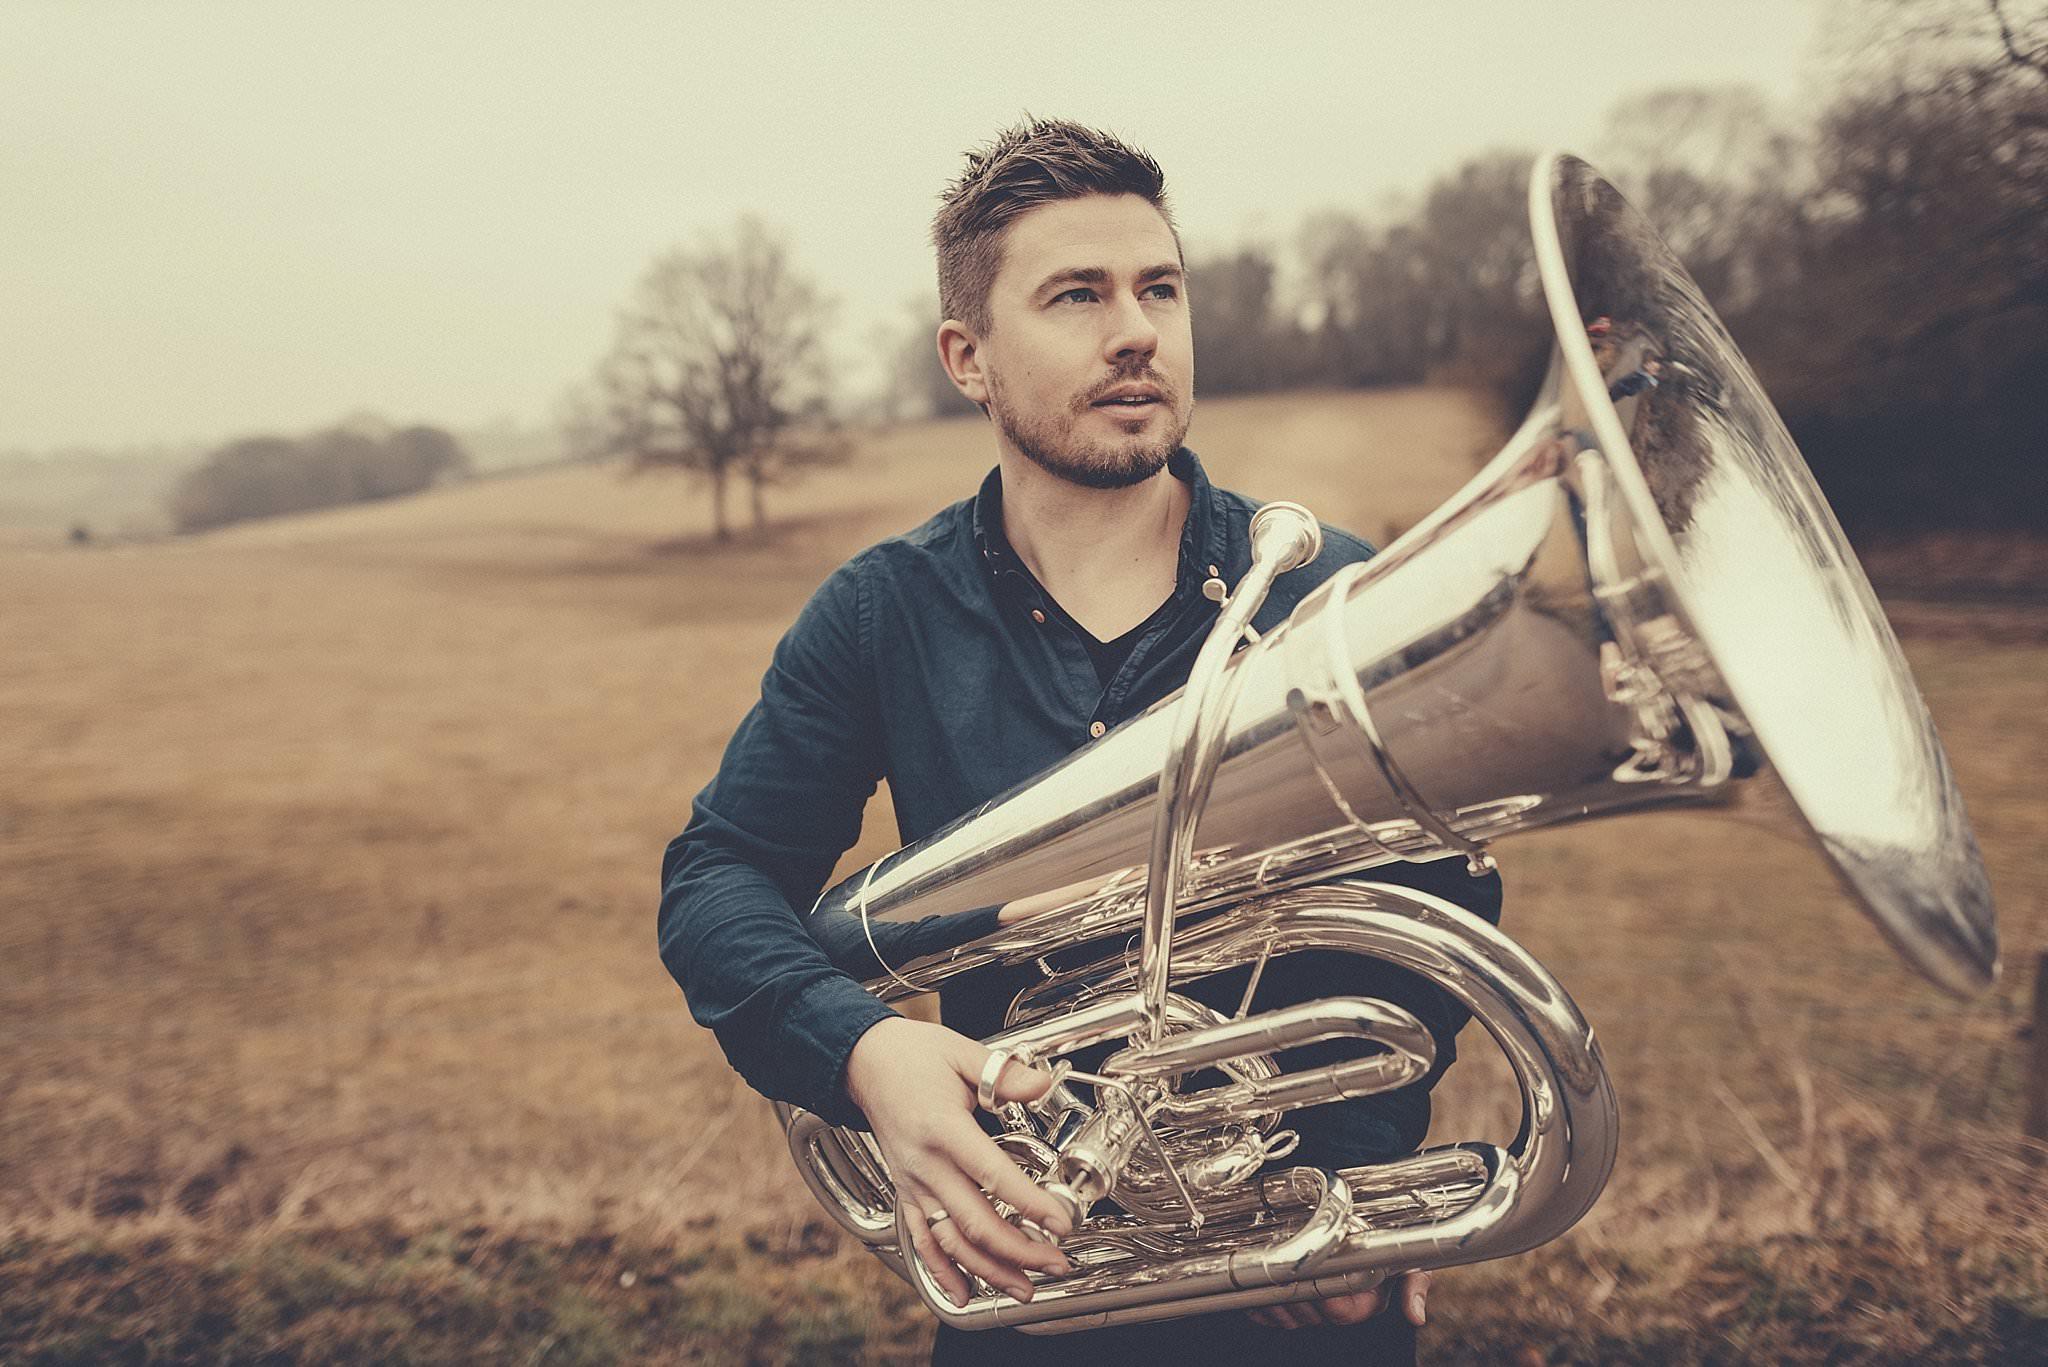 aga-tomaszek-music-photographer-cardiff_1331